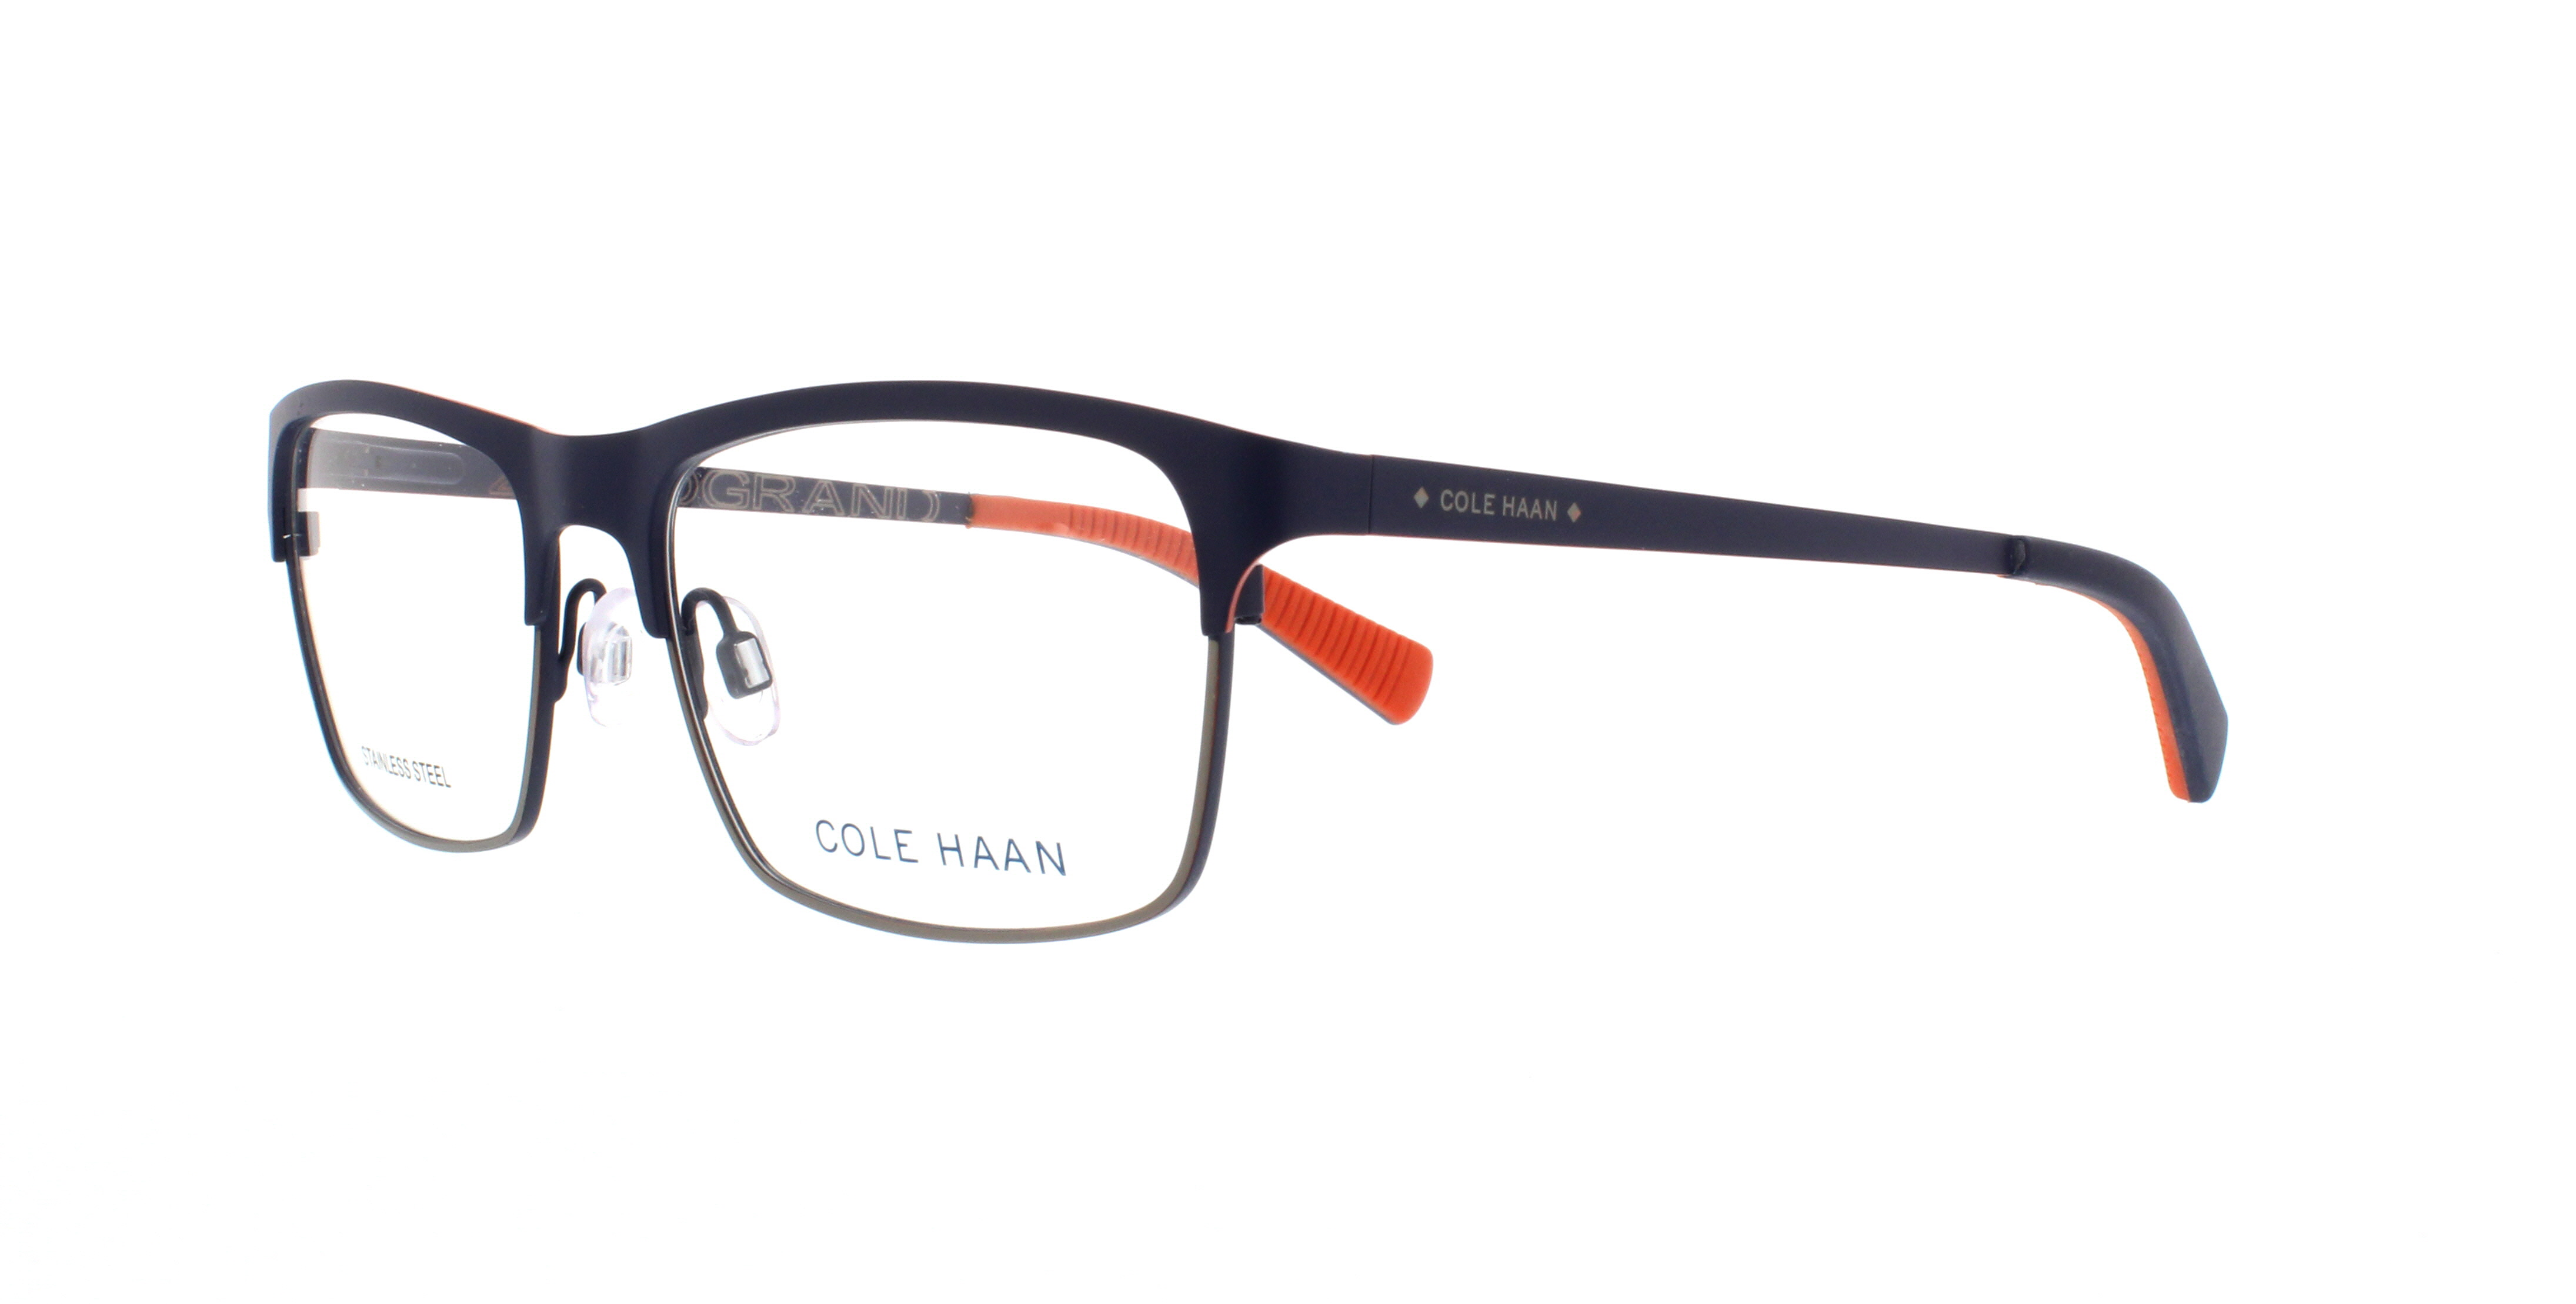 COLE HAAN Eyeglasses CH4010 414 Navy 54MM 788678563200 | eBay